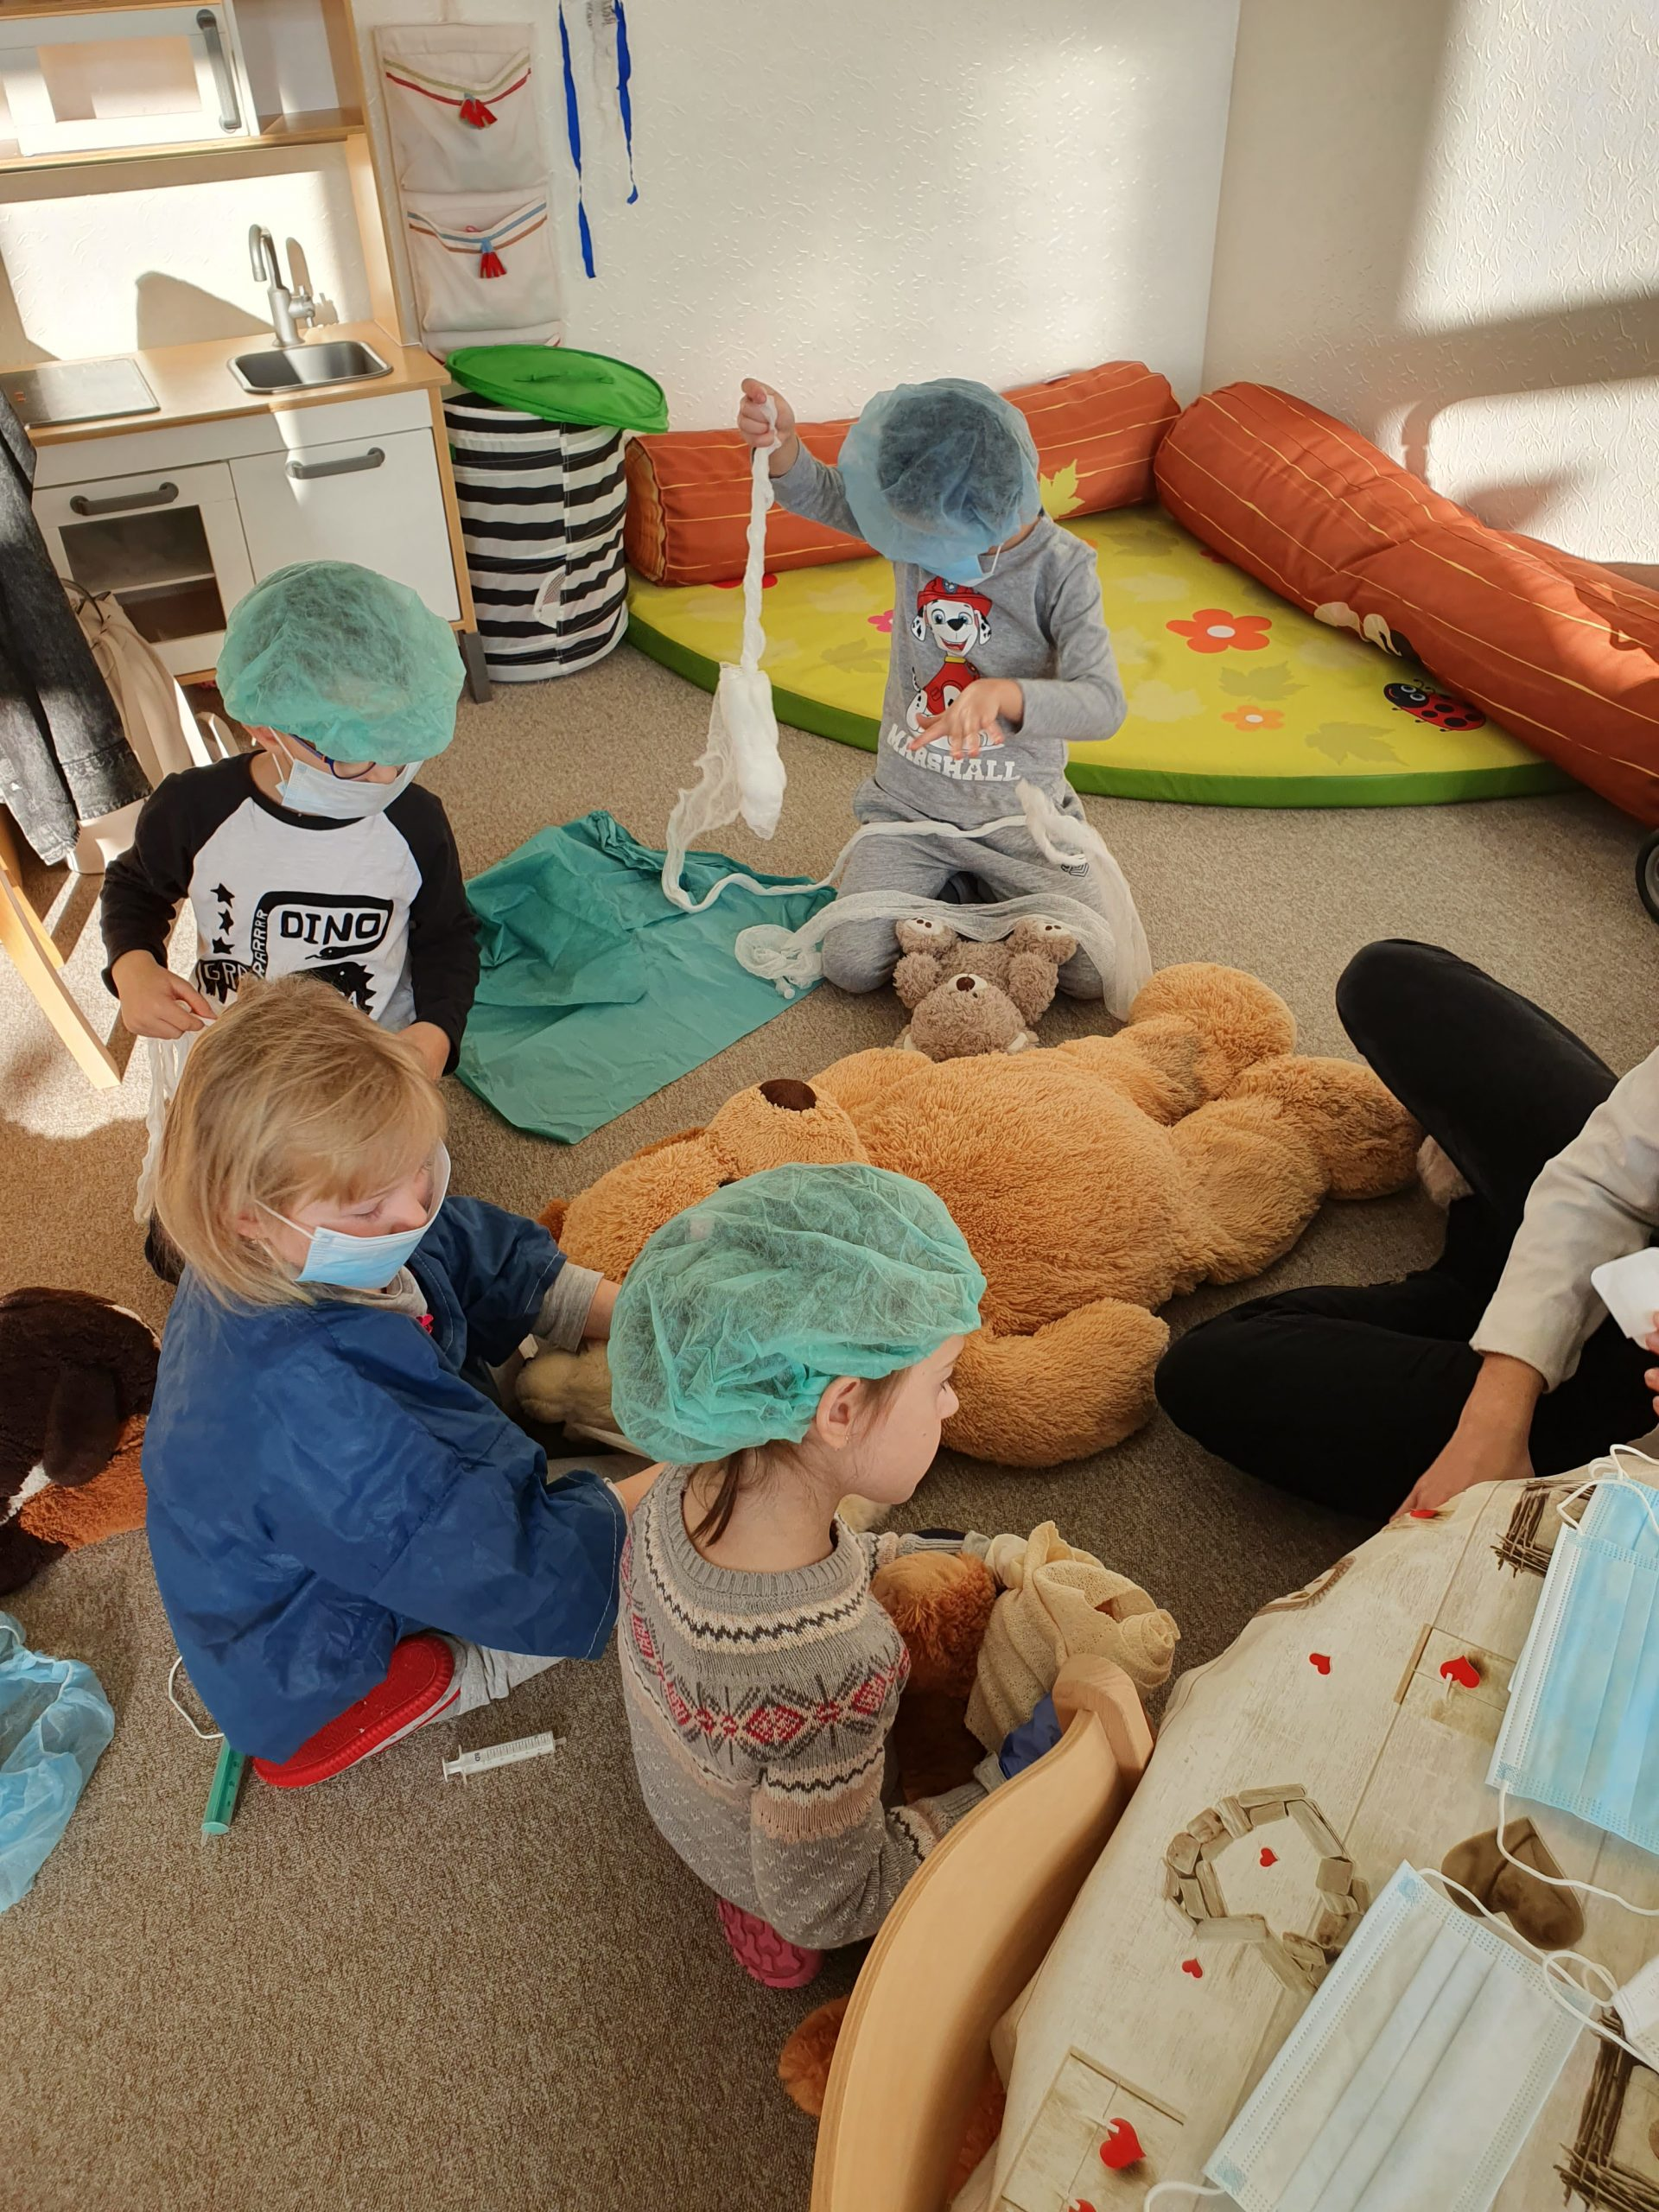 Nemocnica U medvedíka